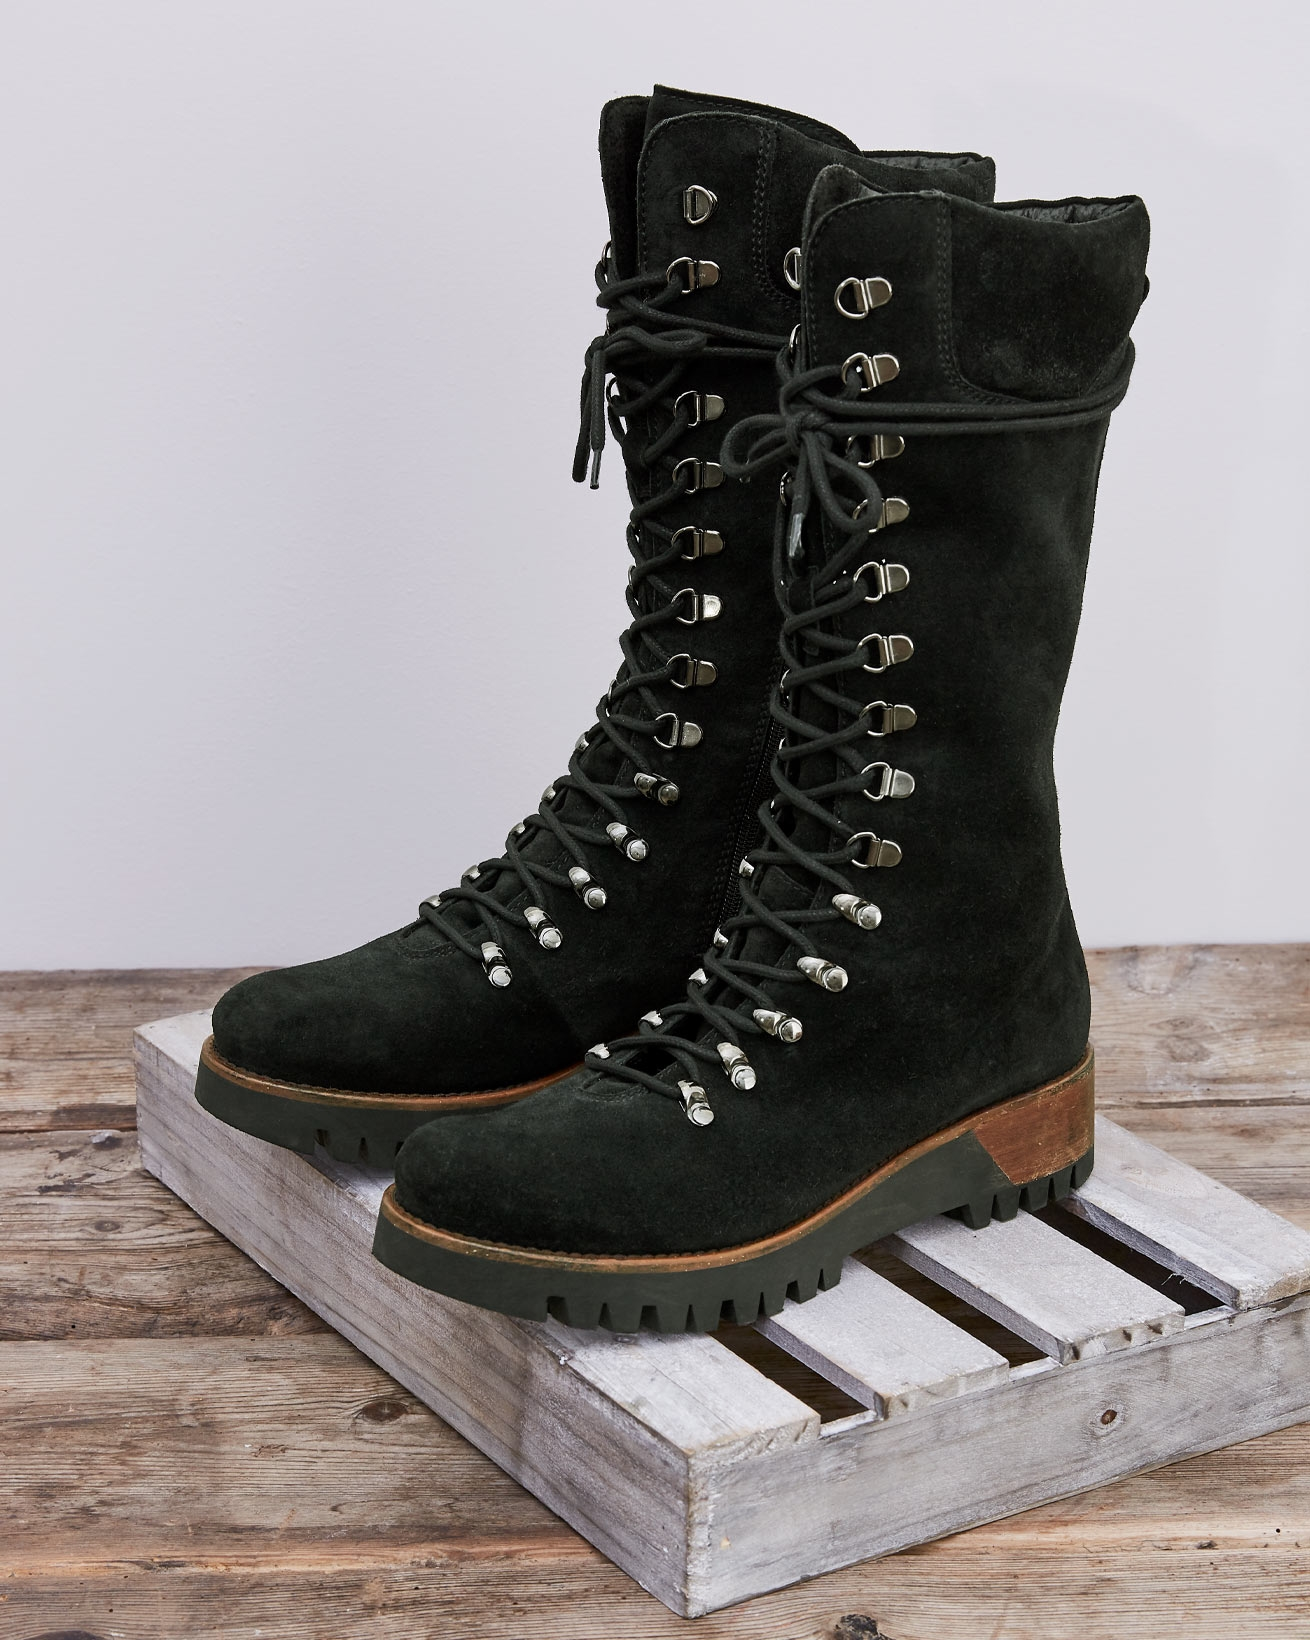 Wilderness Boots - Black - Size 39 - 2725